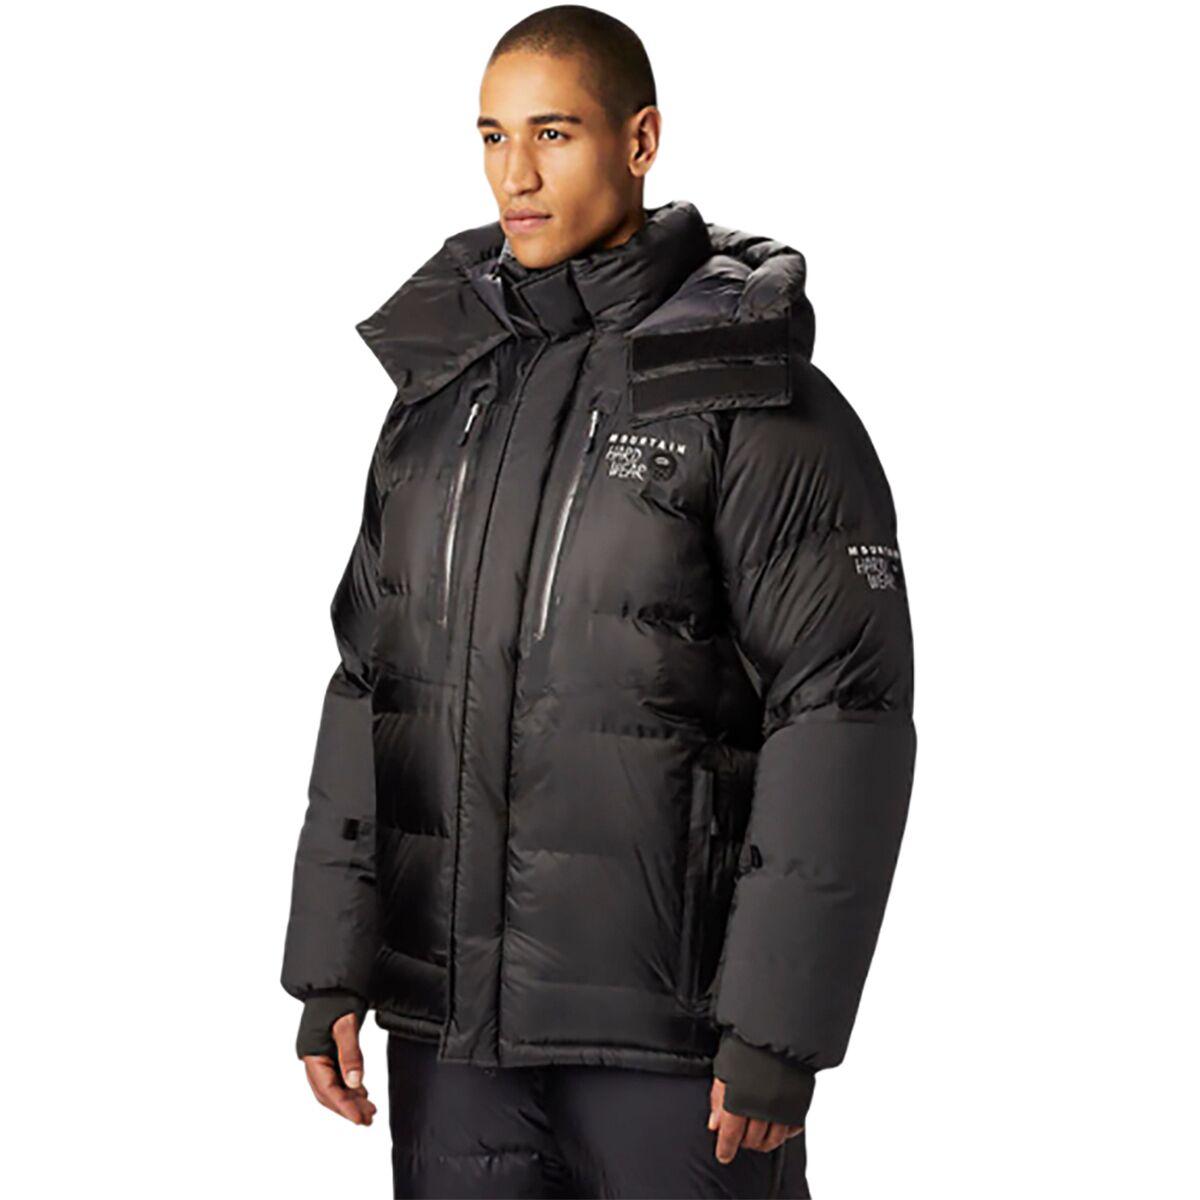 Mountain Hardwear Absolute Zero Parka